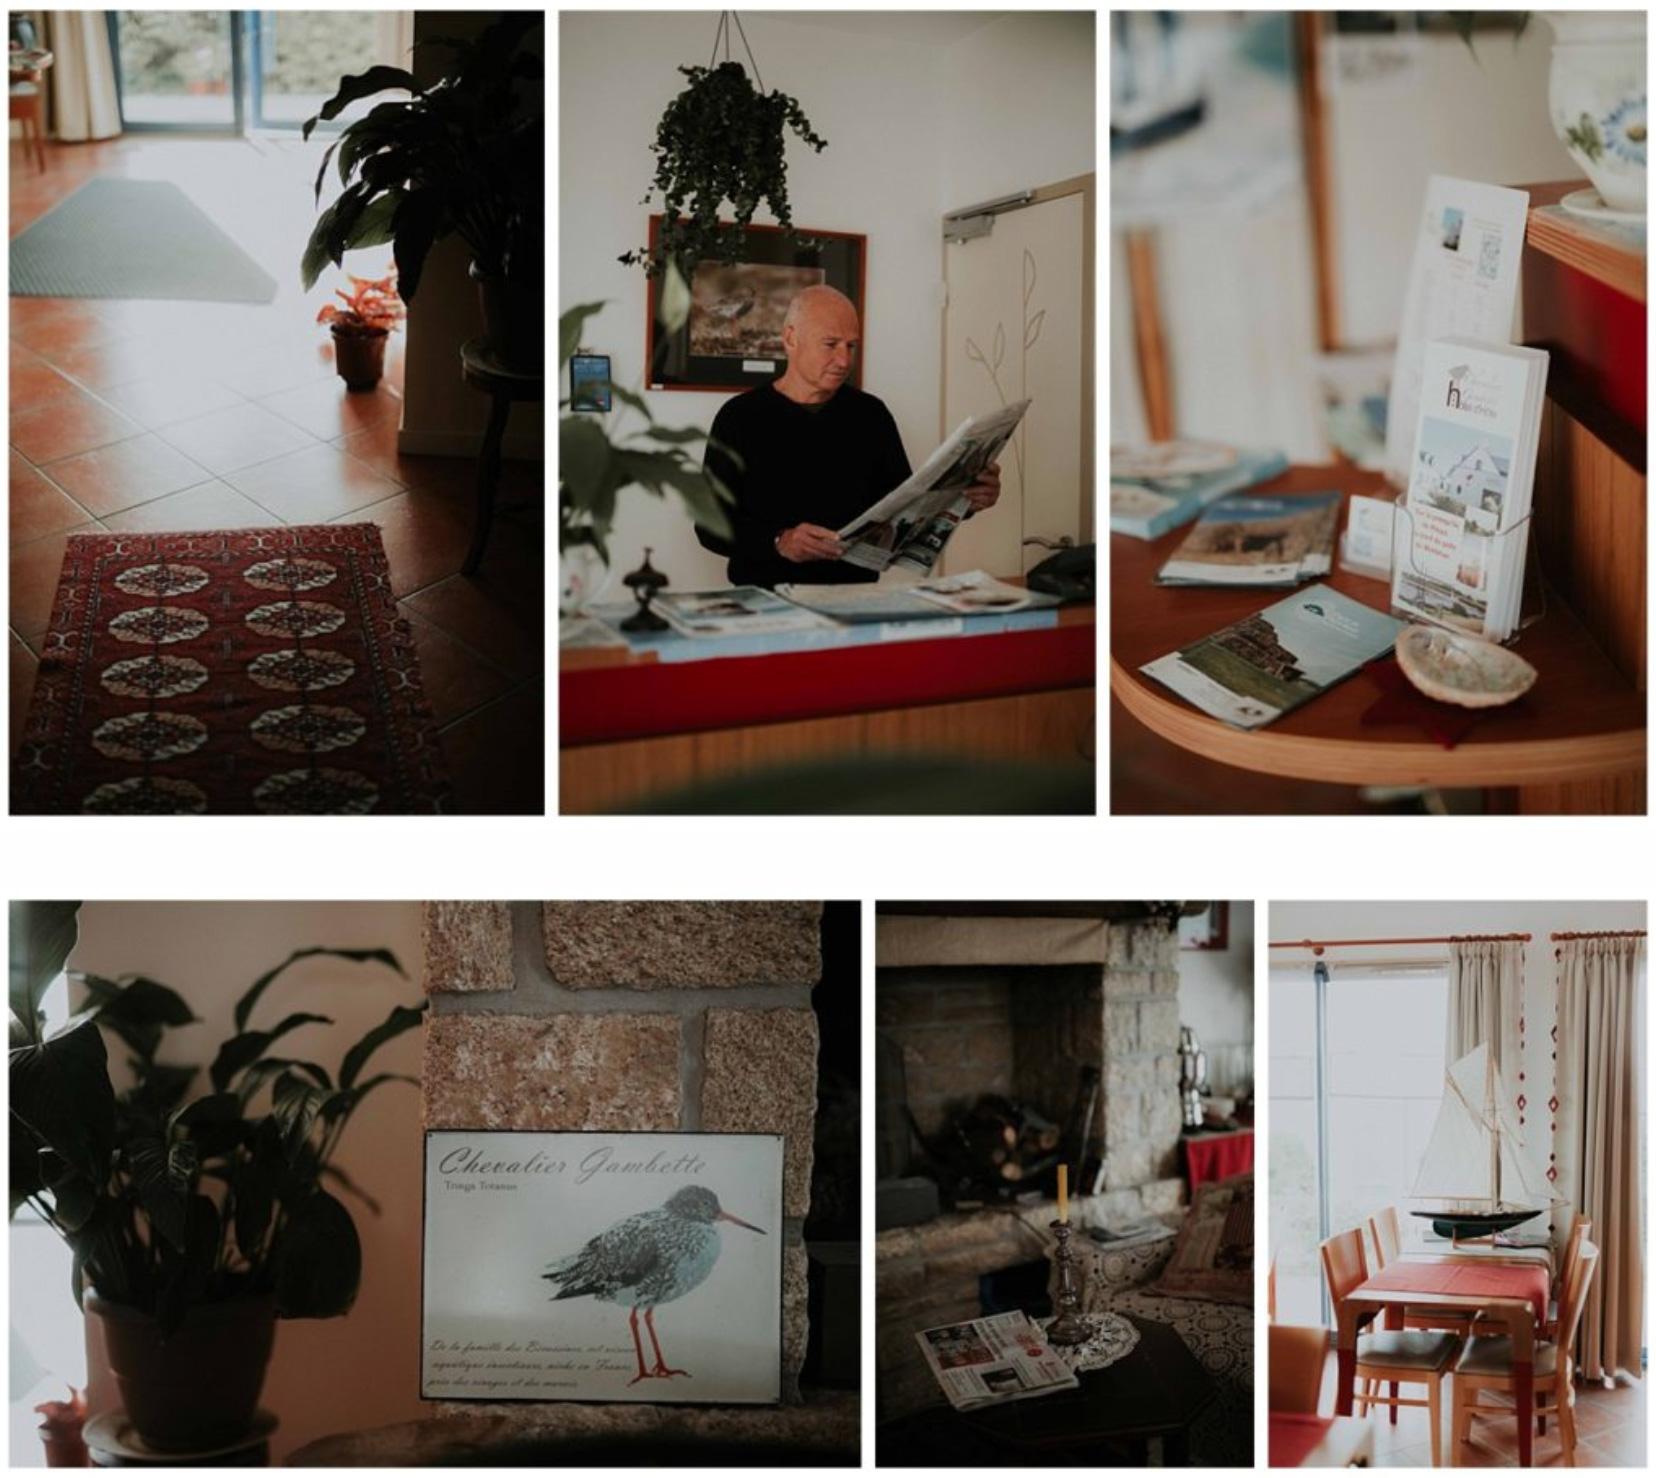 o partir en bretagne avec son chien golf du morbihan h tel chevalier gambette. Black Bedroom Furniture Sets. Home Design Ideas